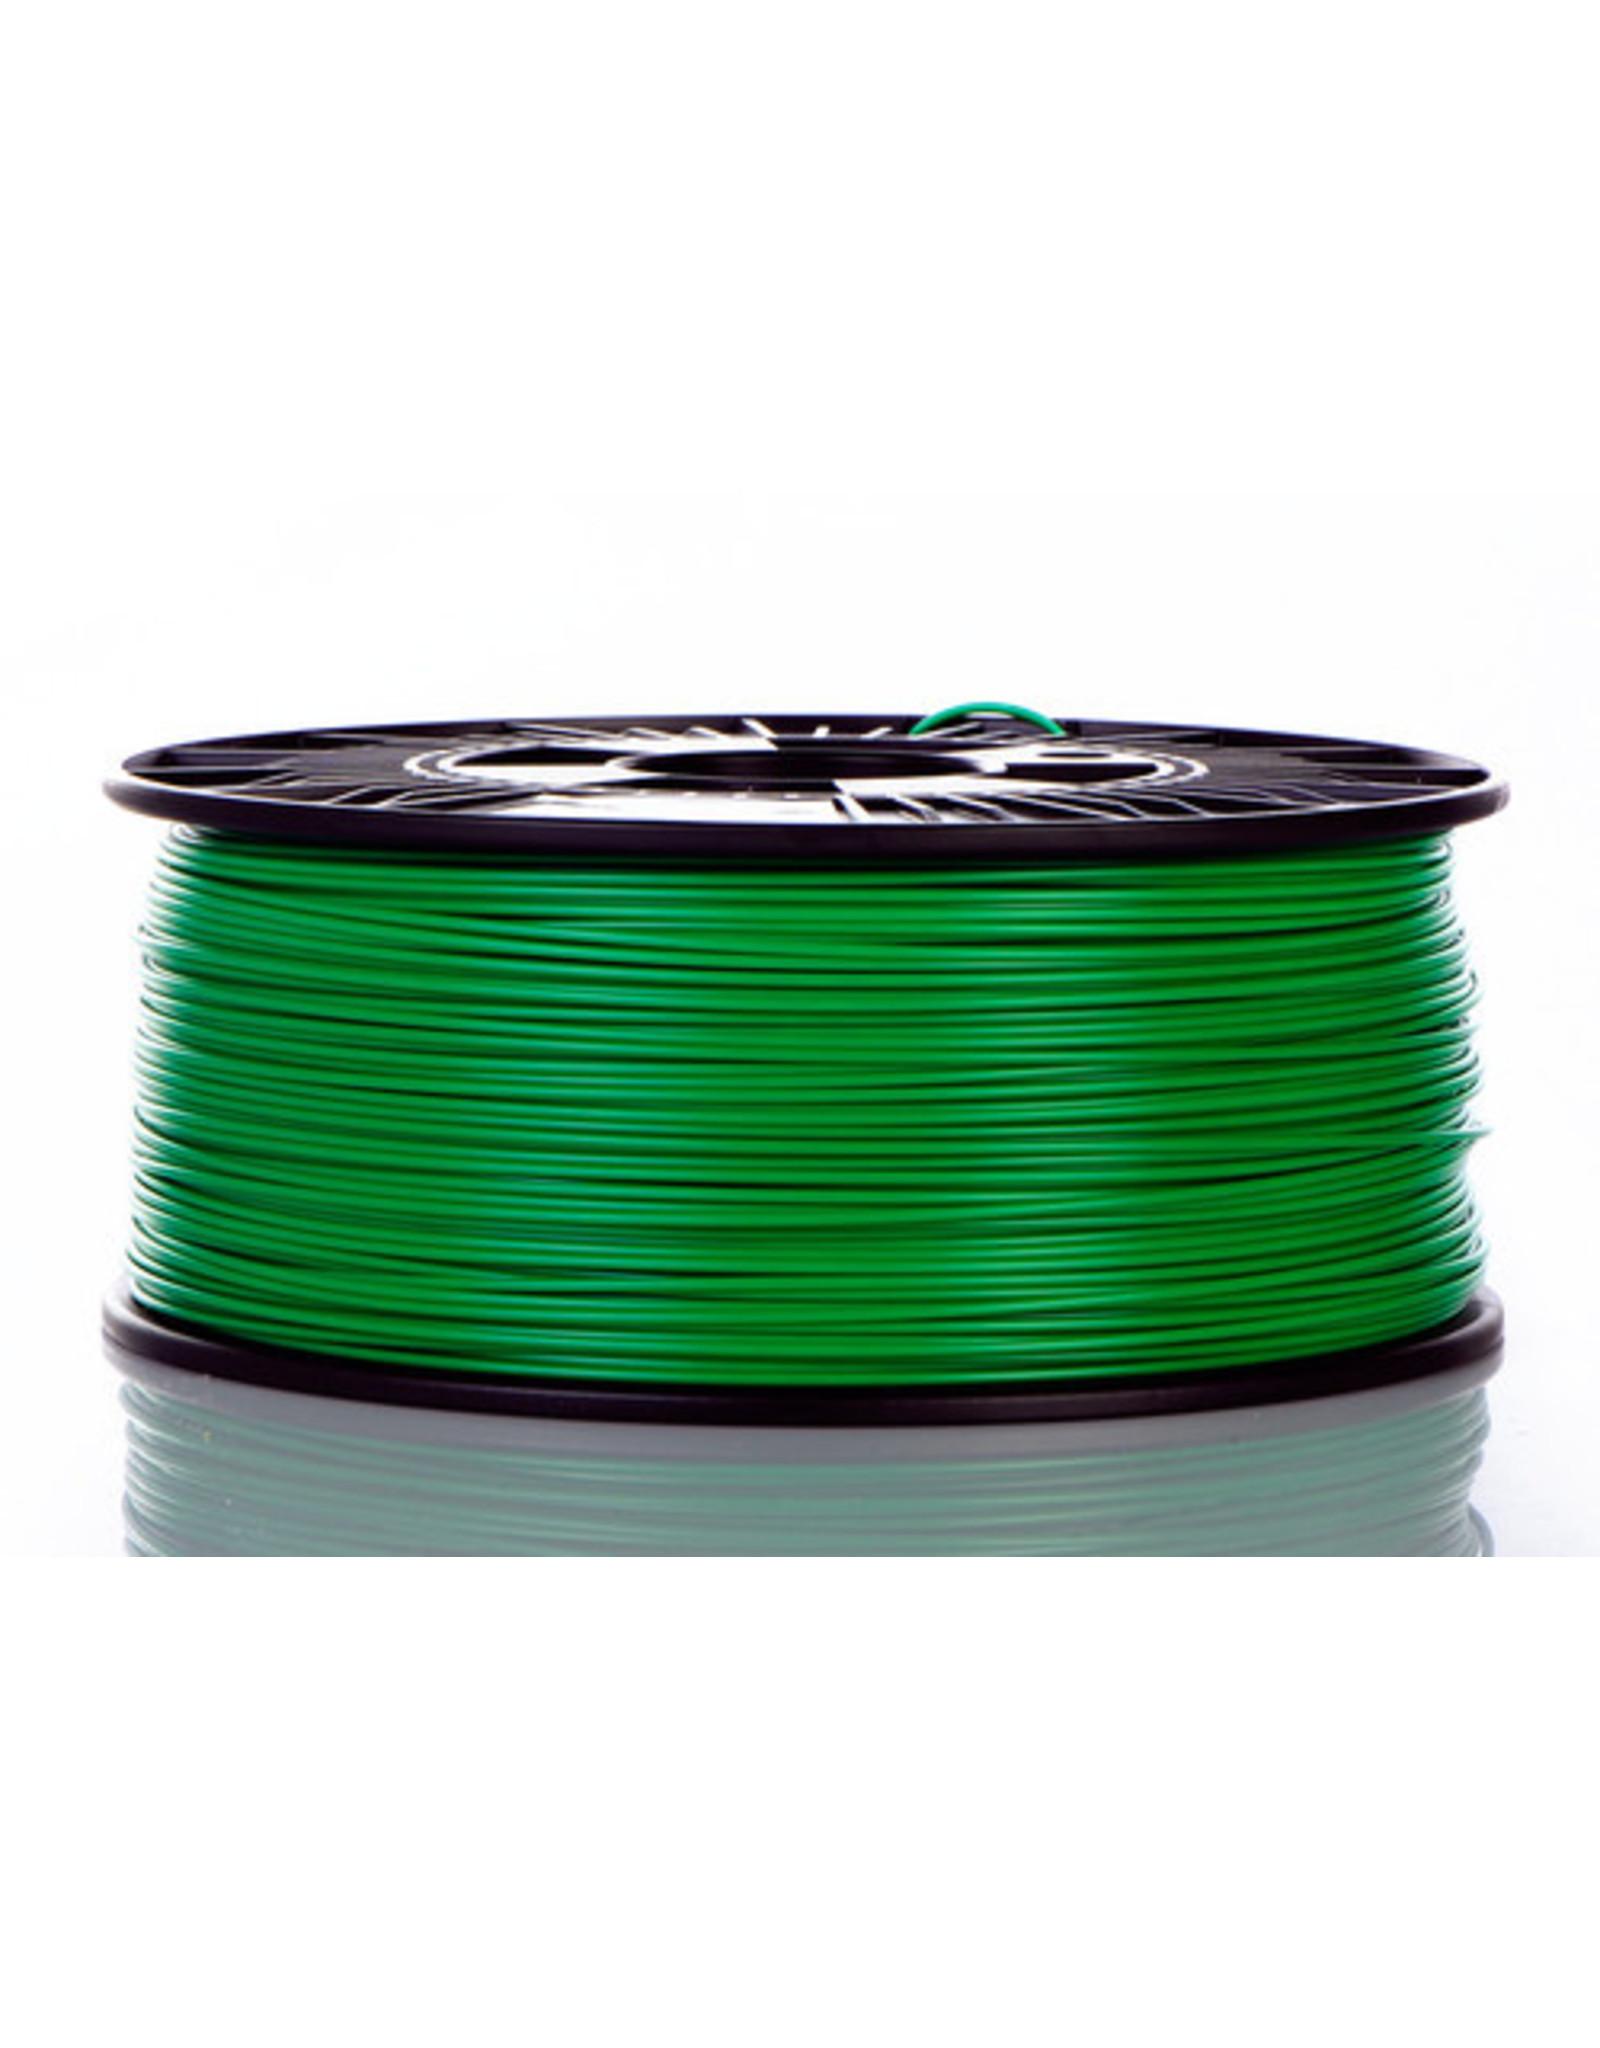 Material4Print ABS Hunter Green 1.75mm